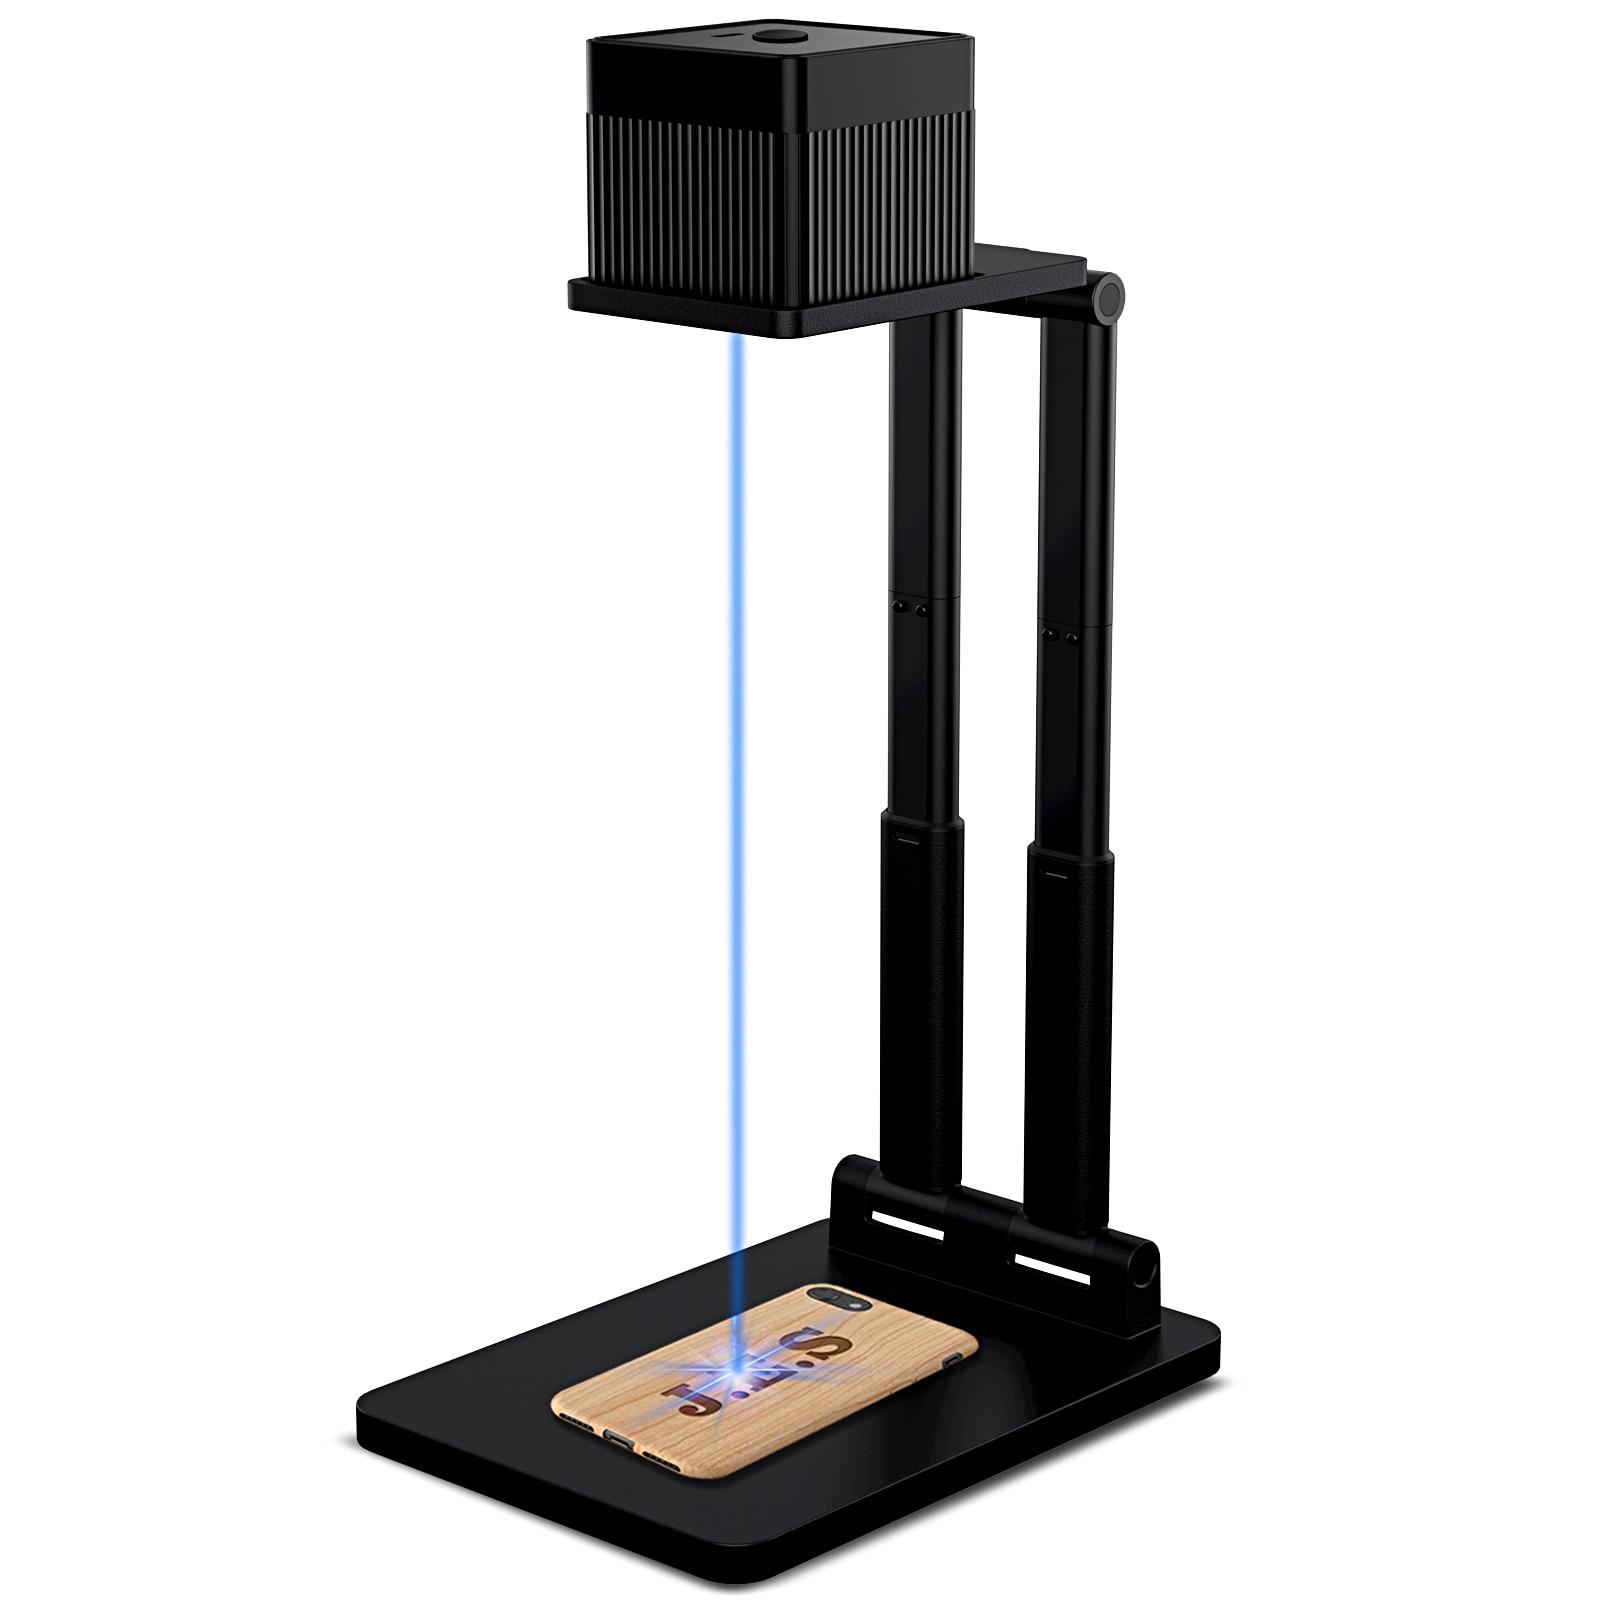 NEW Laser Engraver 3D Printer Engraving Machine Desktop Etcher Cutter Engraver with Bracket Portable with Bluetooth LC100 enlarge